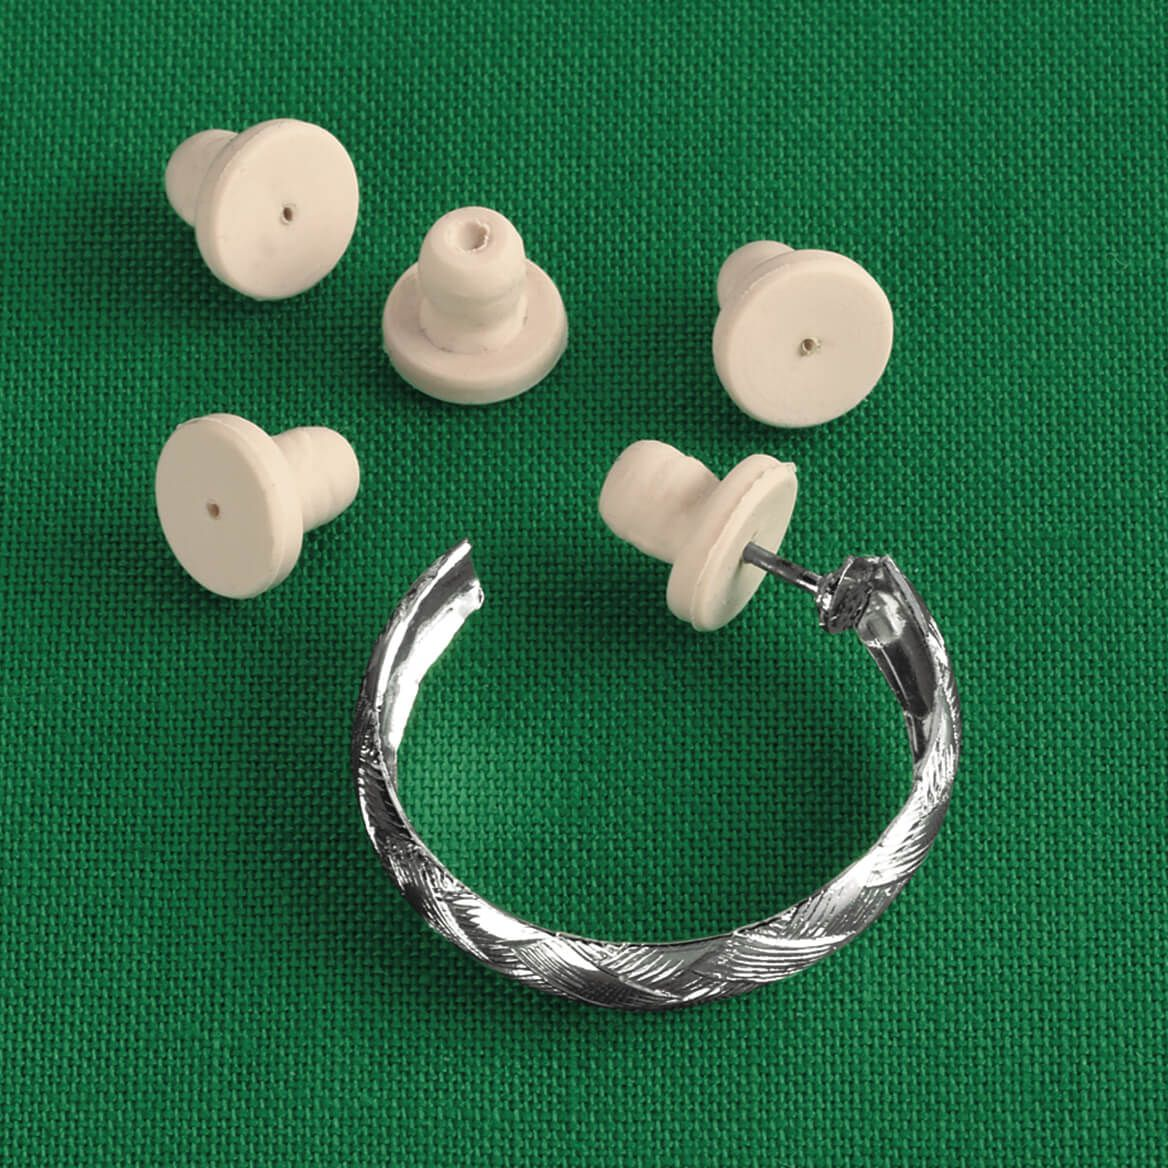 Sensitive Earring Backs 12 Pieces-312339